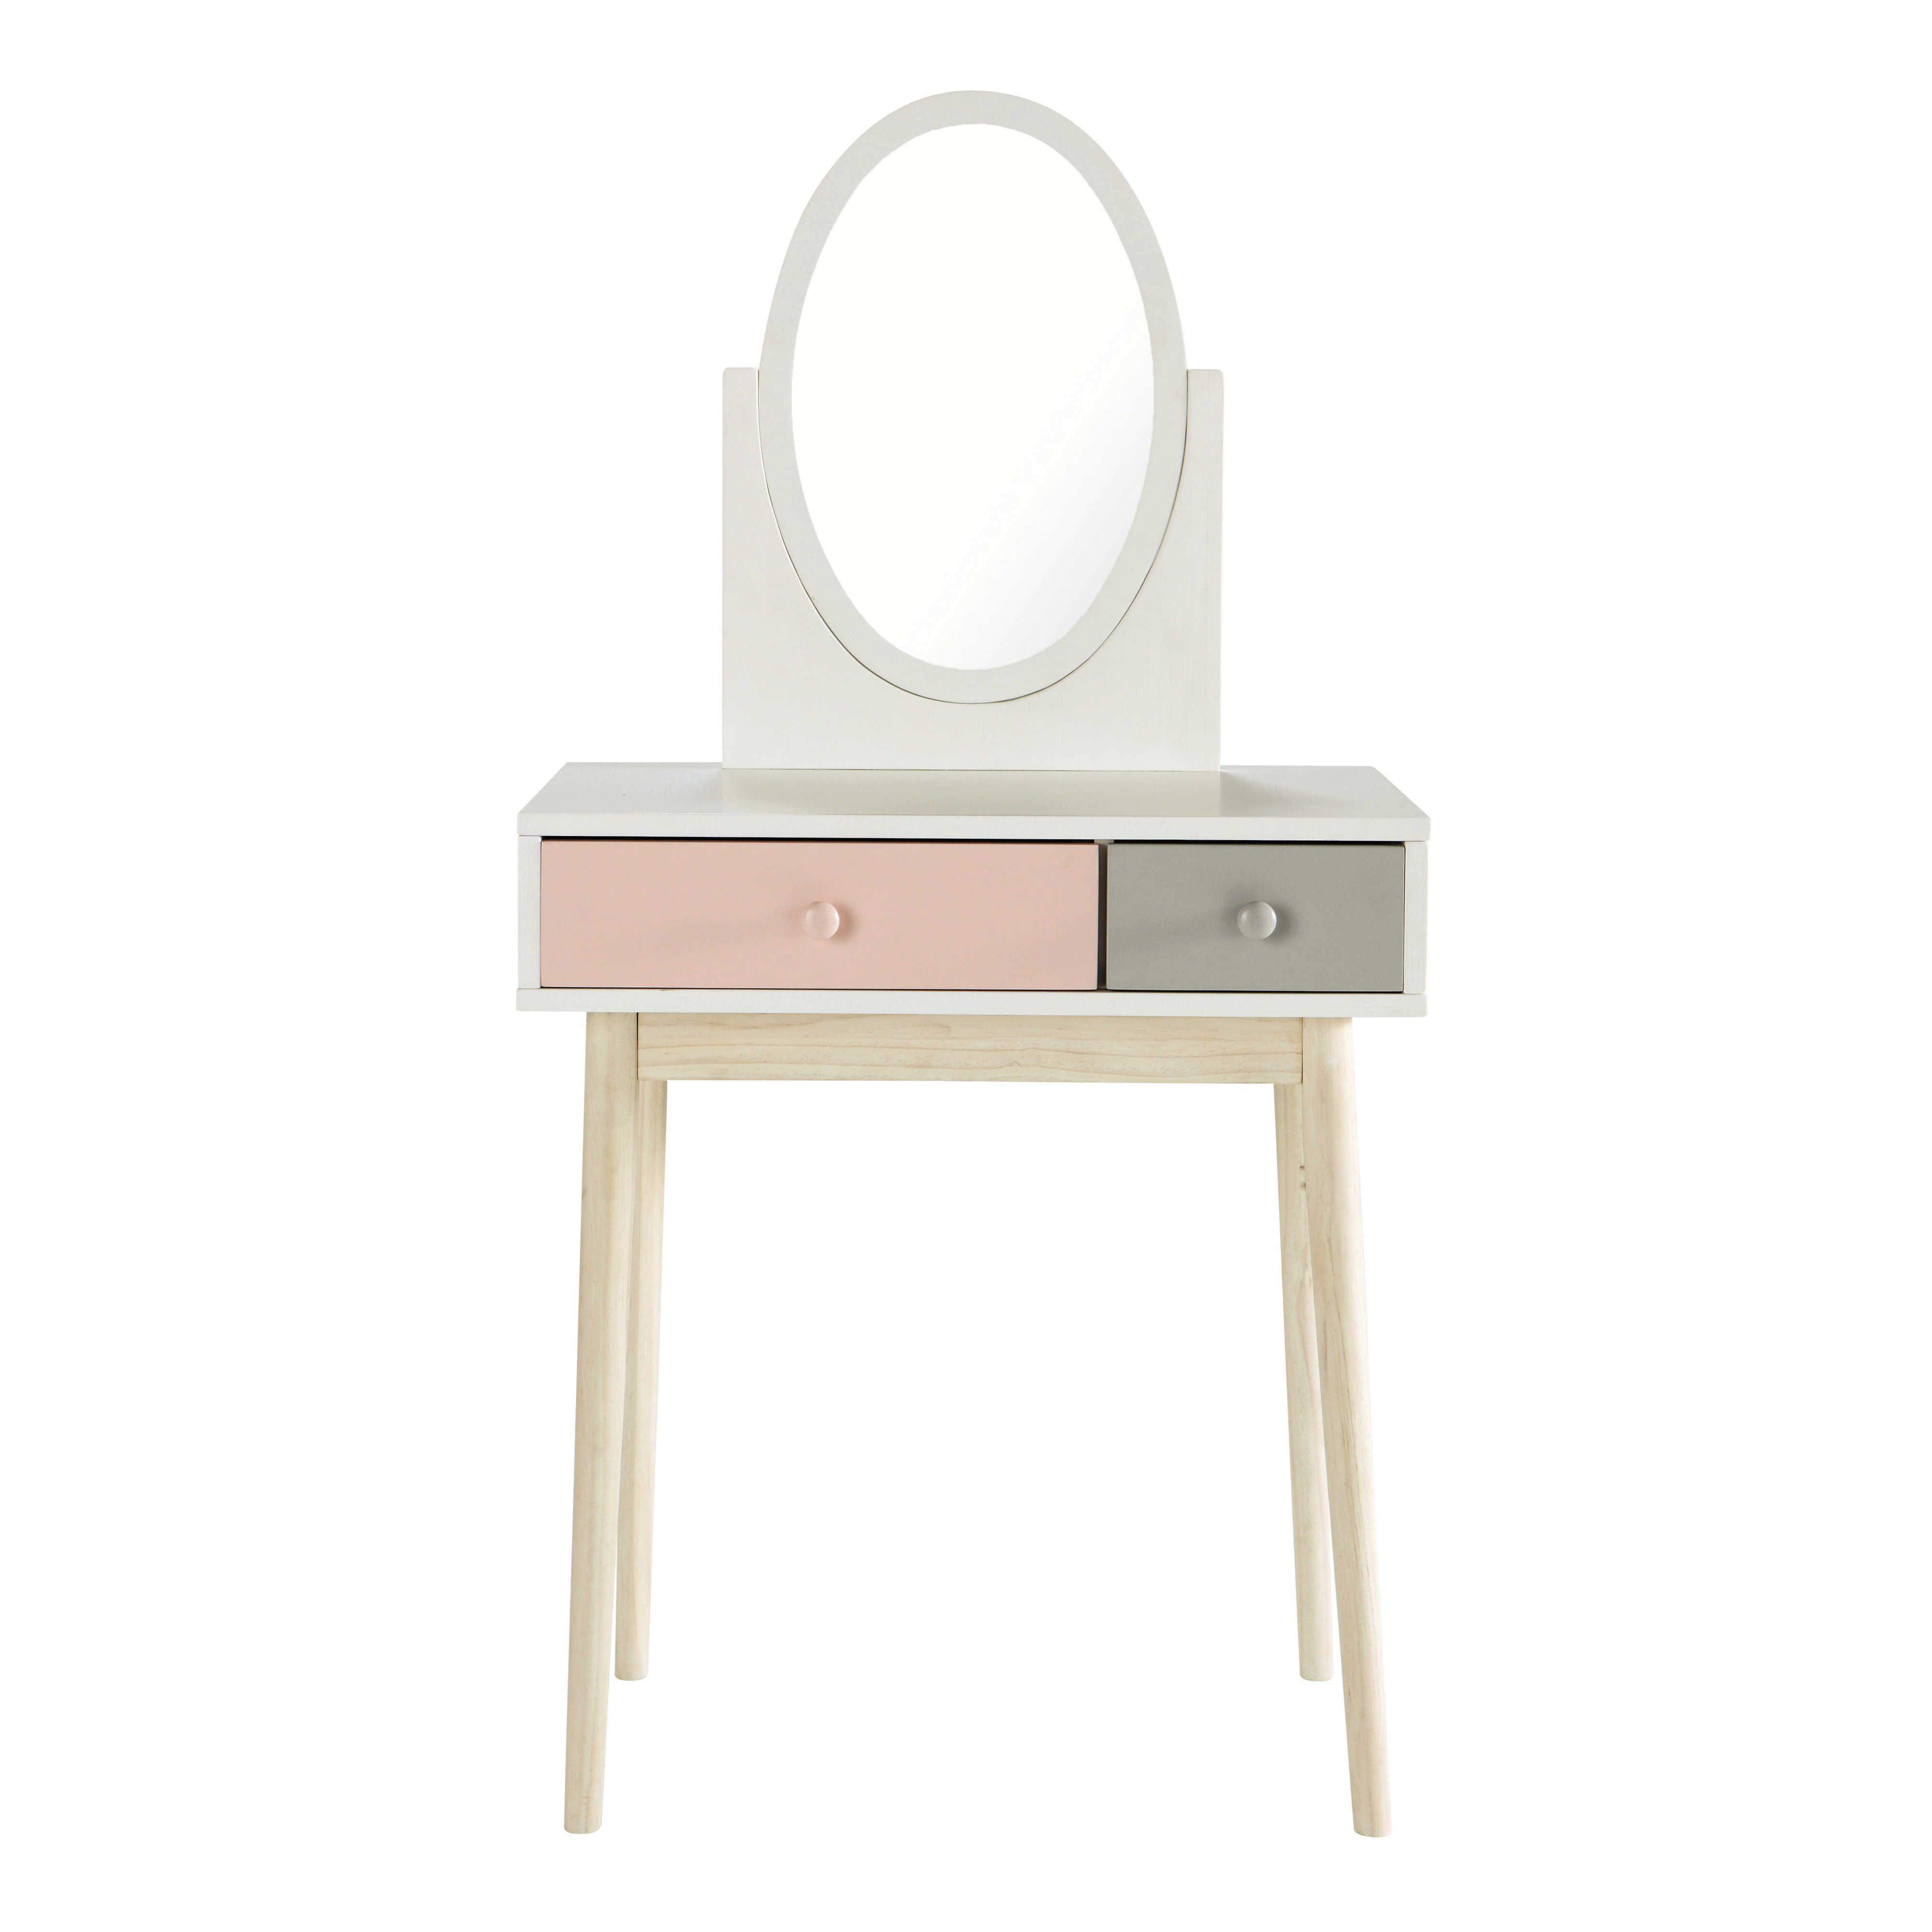 coiffeuse vintage blanche et rose in 2019 vintage dressing tables white vintage